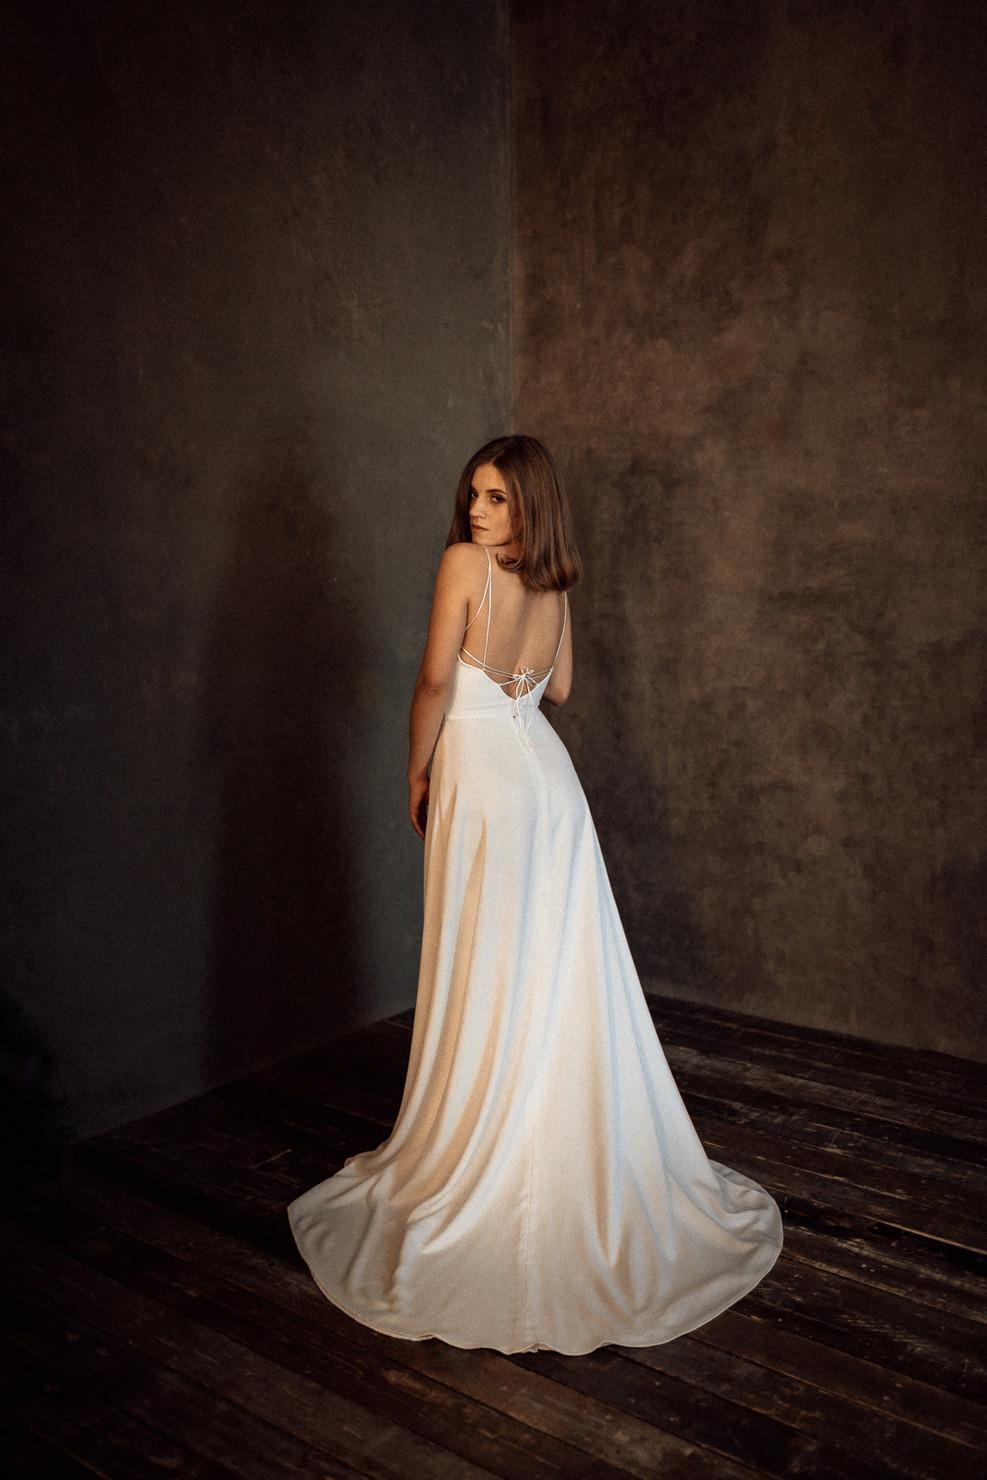 WINTER WEDDING - STYLED SHOOT - WEB-151.